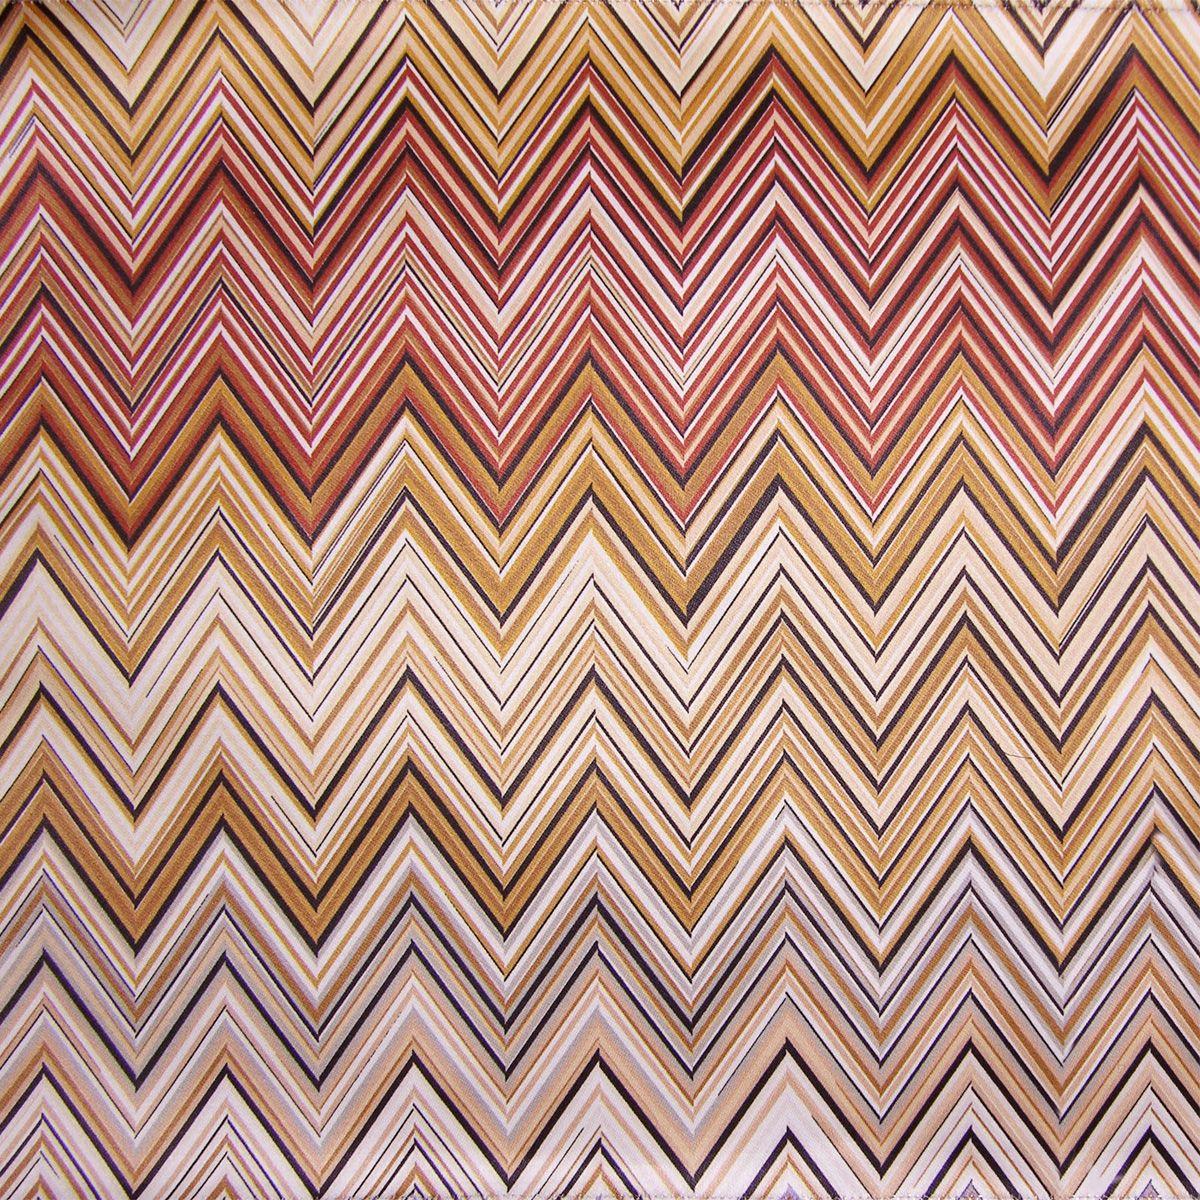 Missoni Fabric: Stark Fabric - Stark Carpet